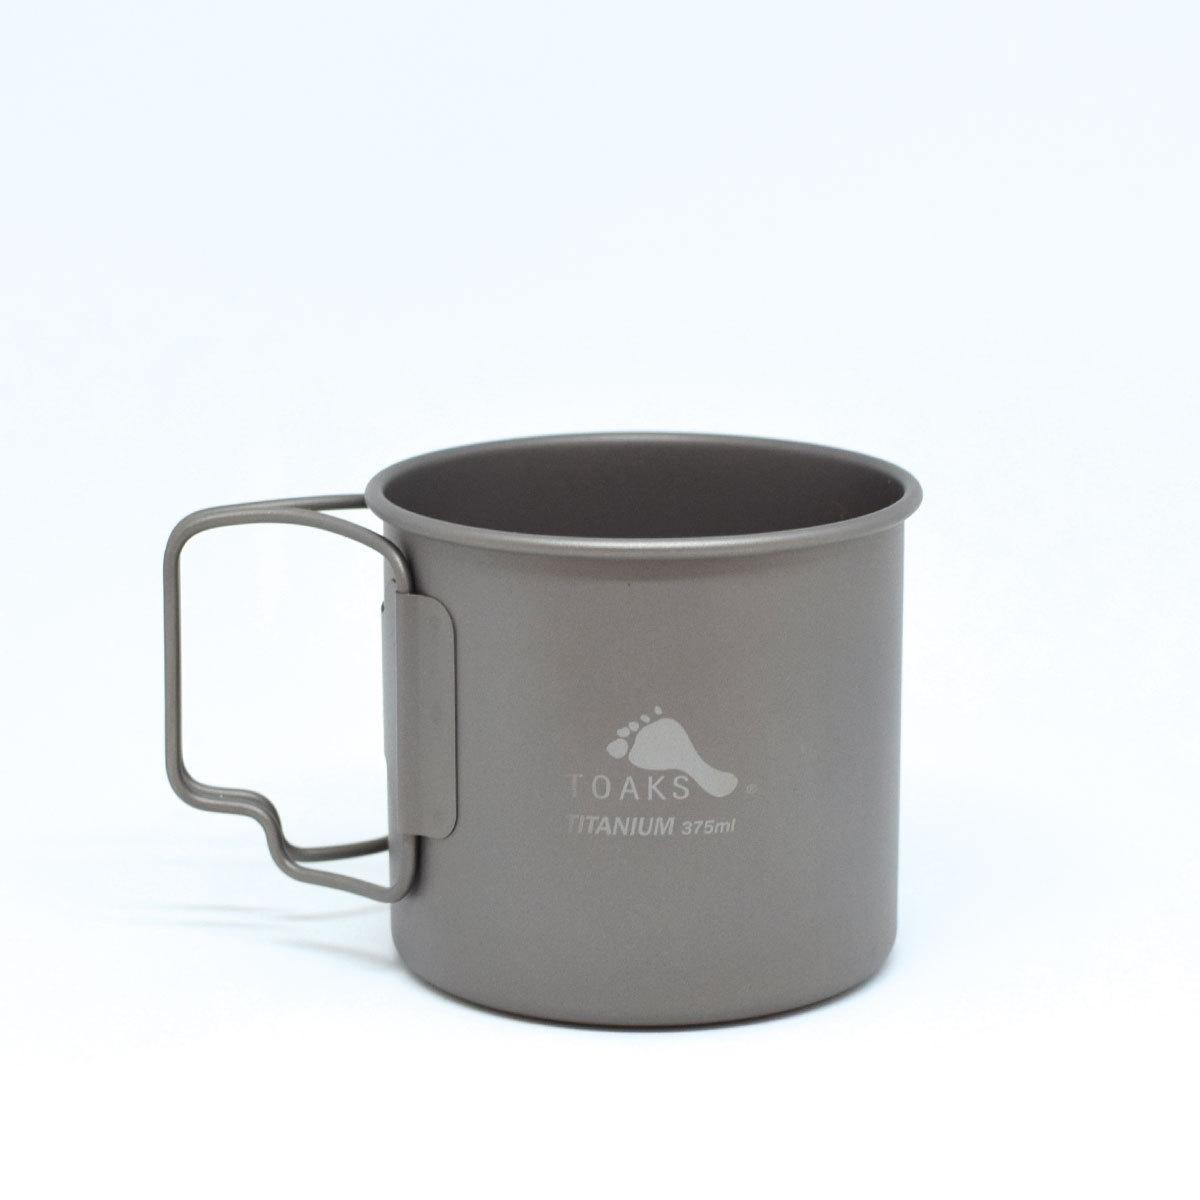 TOAKS(トークス)TITANIUM CUP 375ml チタニウムカップ